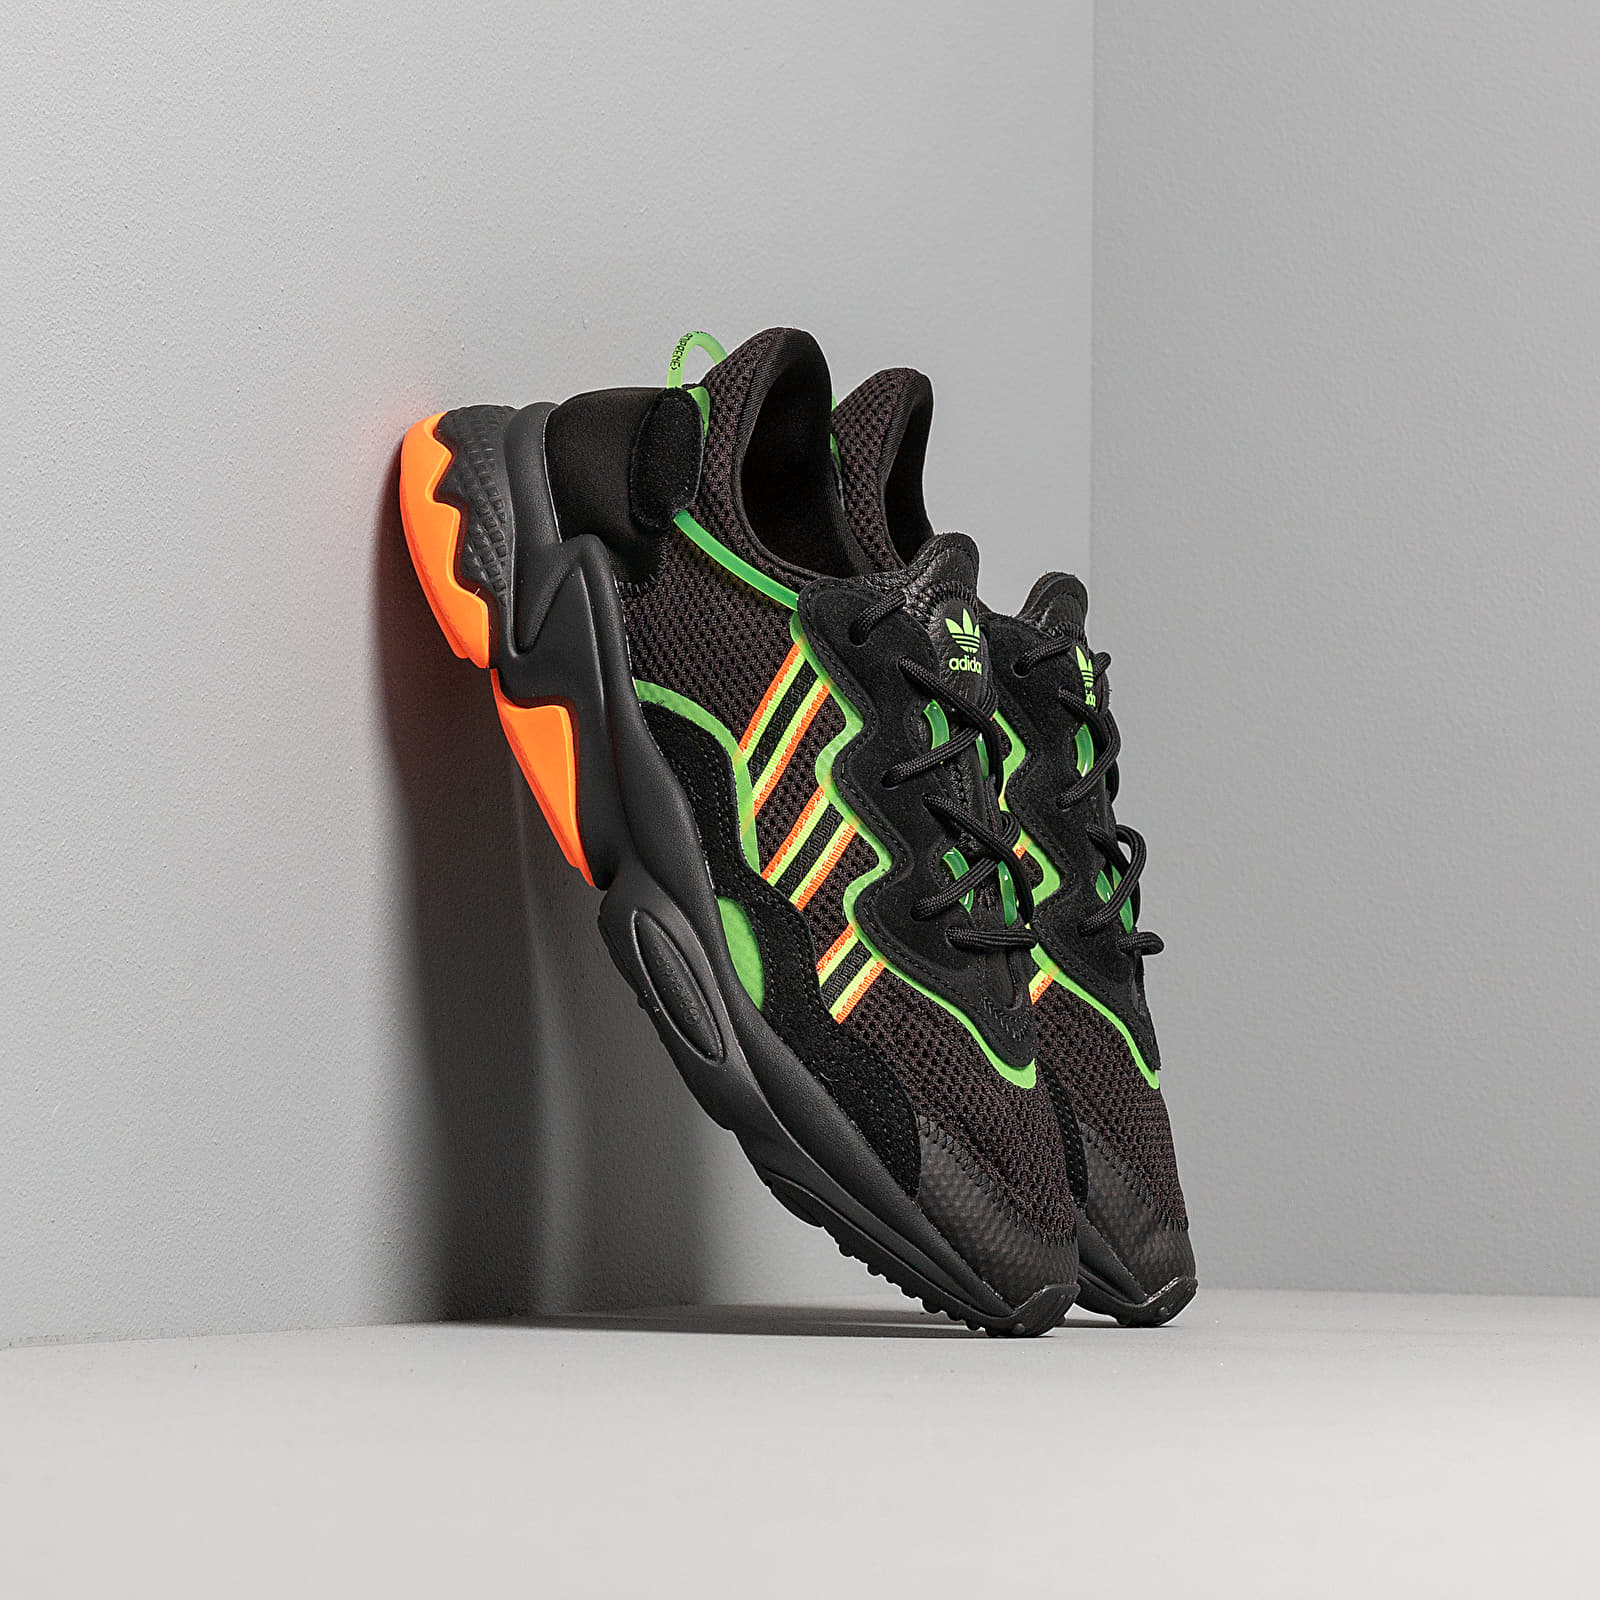 Zapatillas Hombre adidas Ozweego Core Black/ Semi Green/ Hi-Res Collegaite